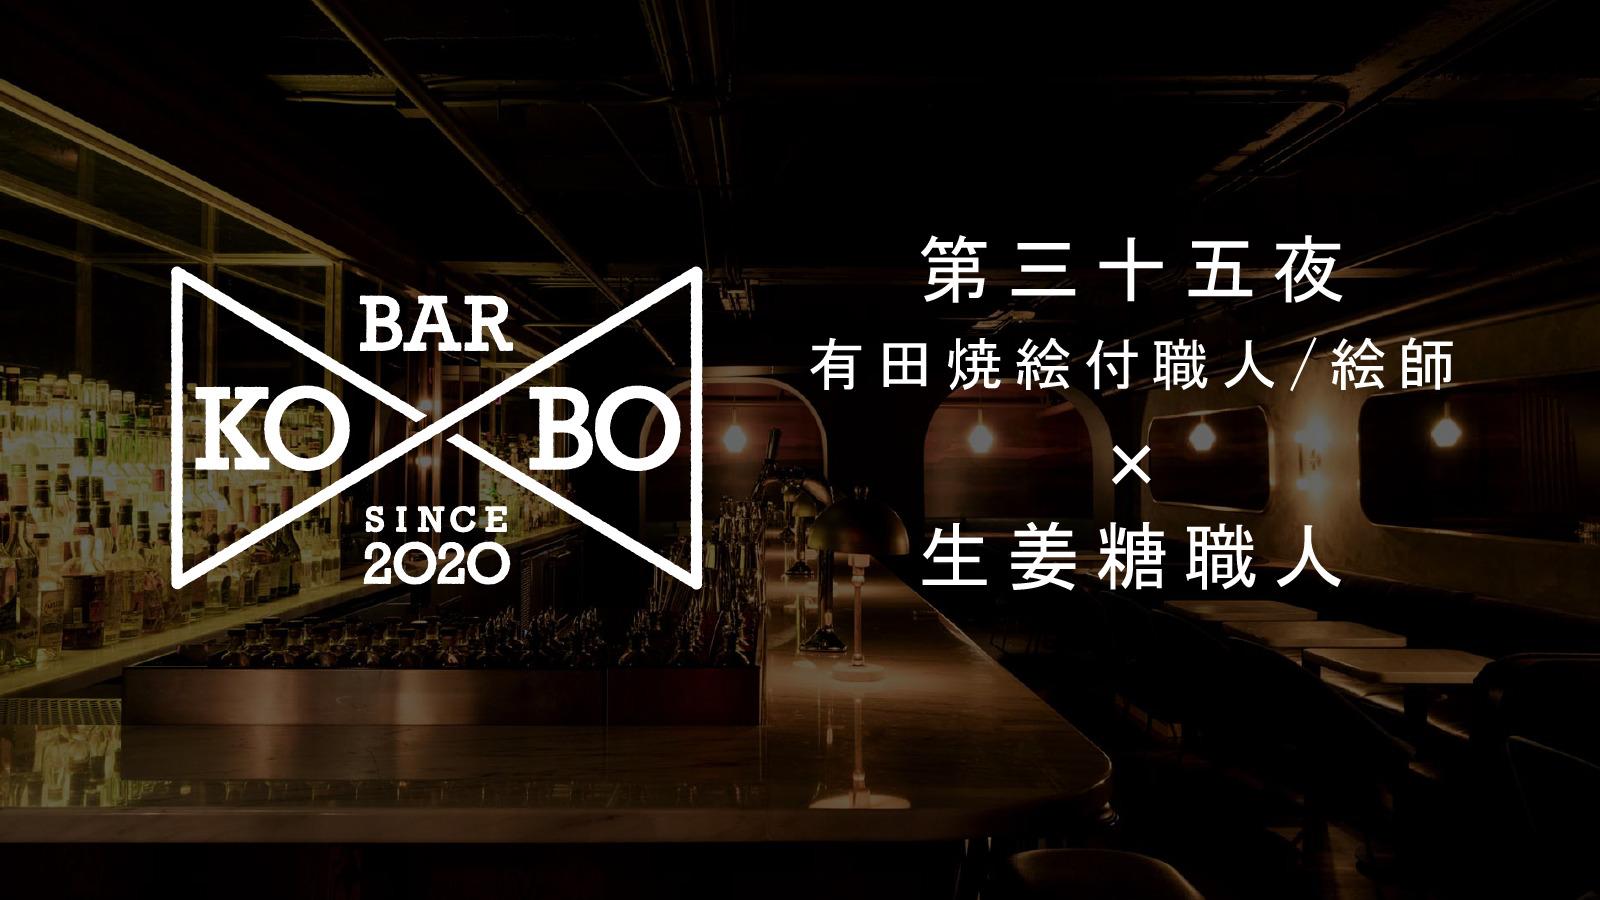 【Bar KO-BO 第三十五夜】生姜糖職人×有田焼絵付職人/絵師